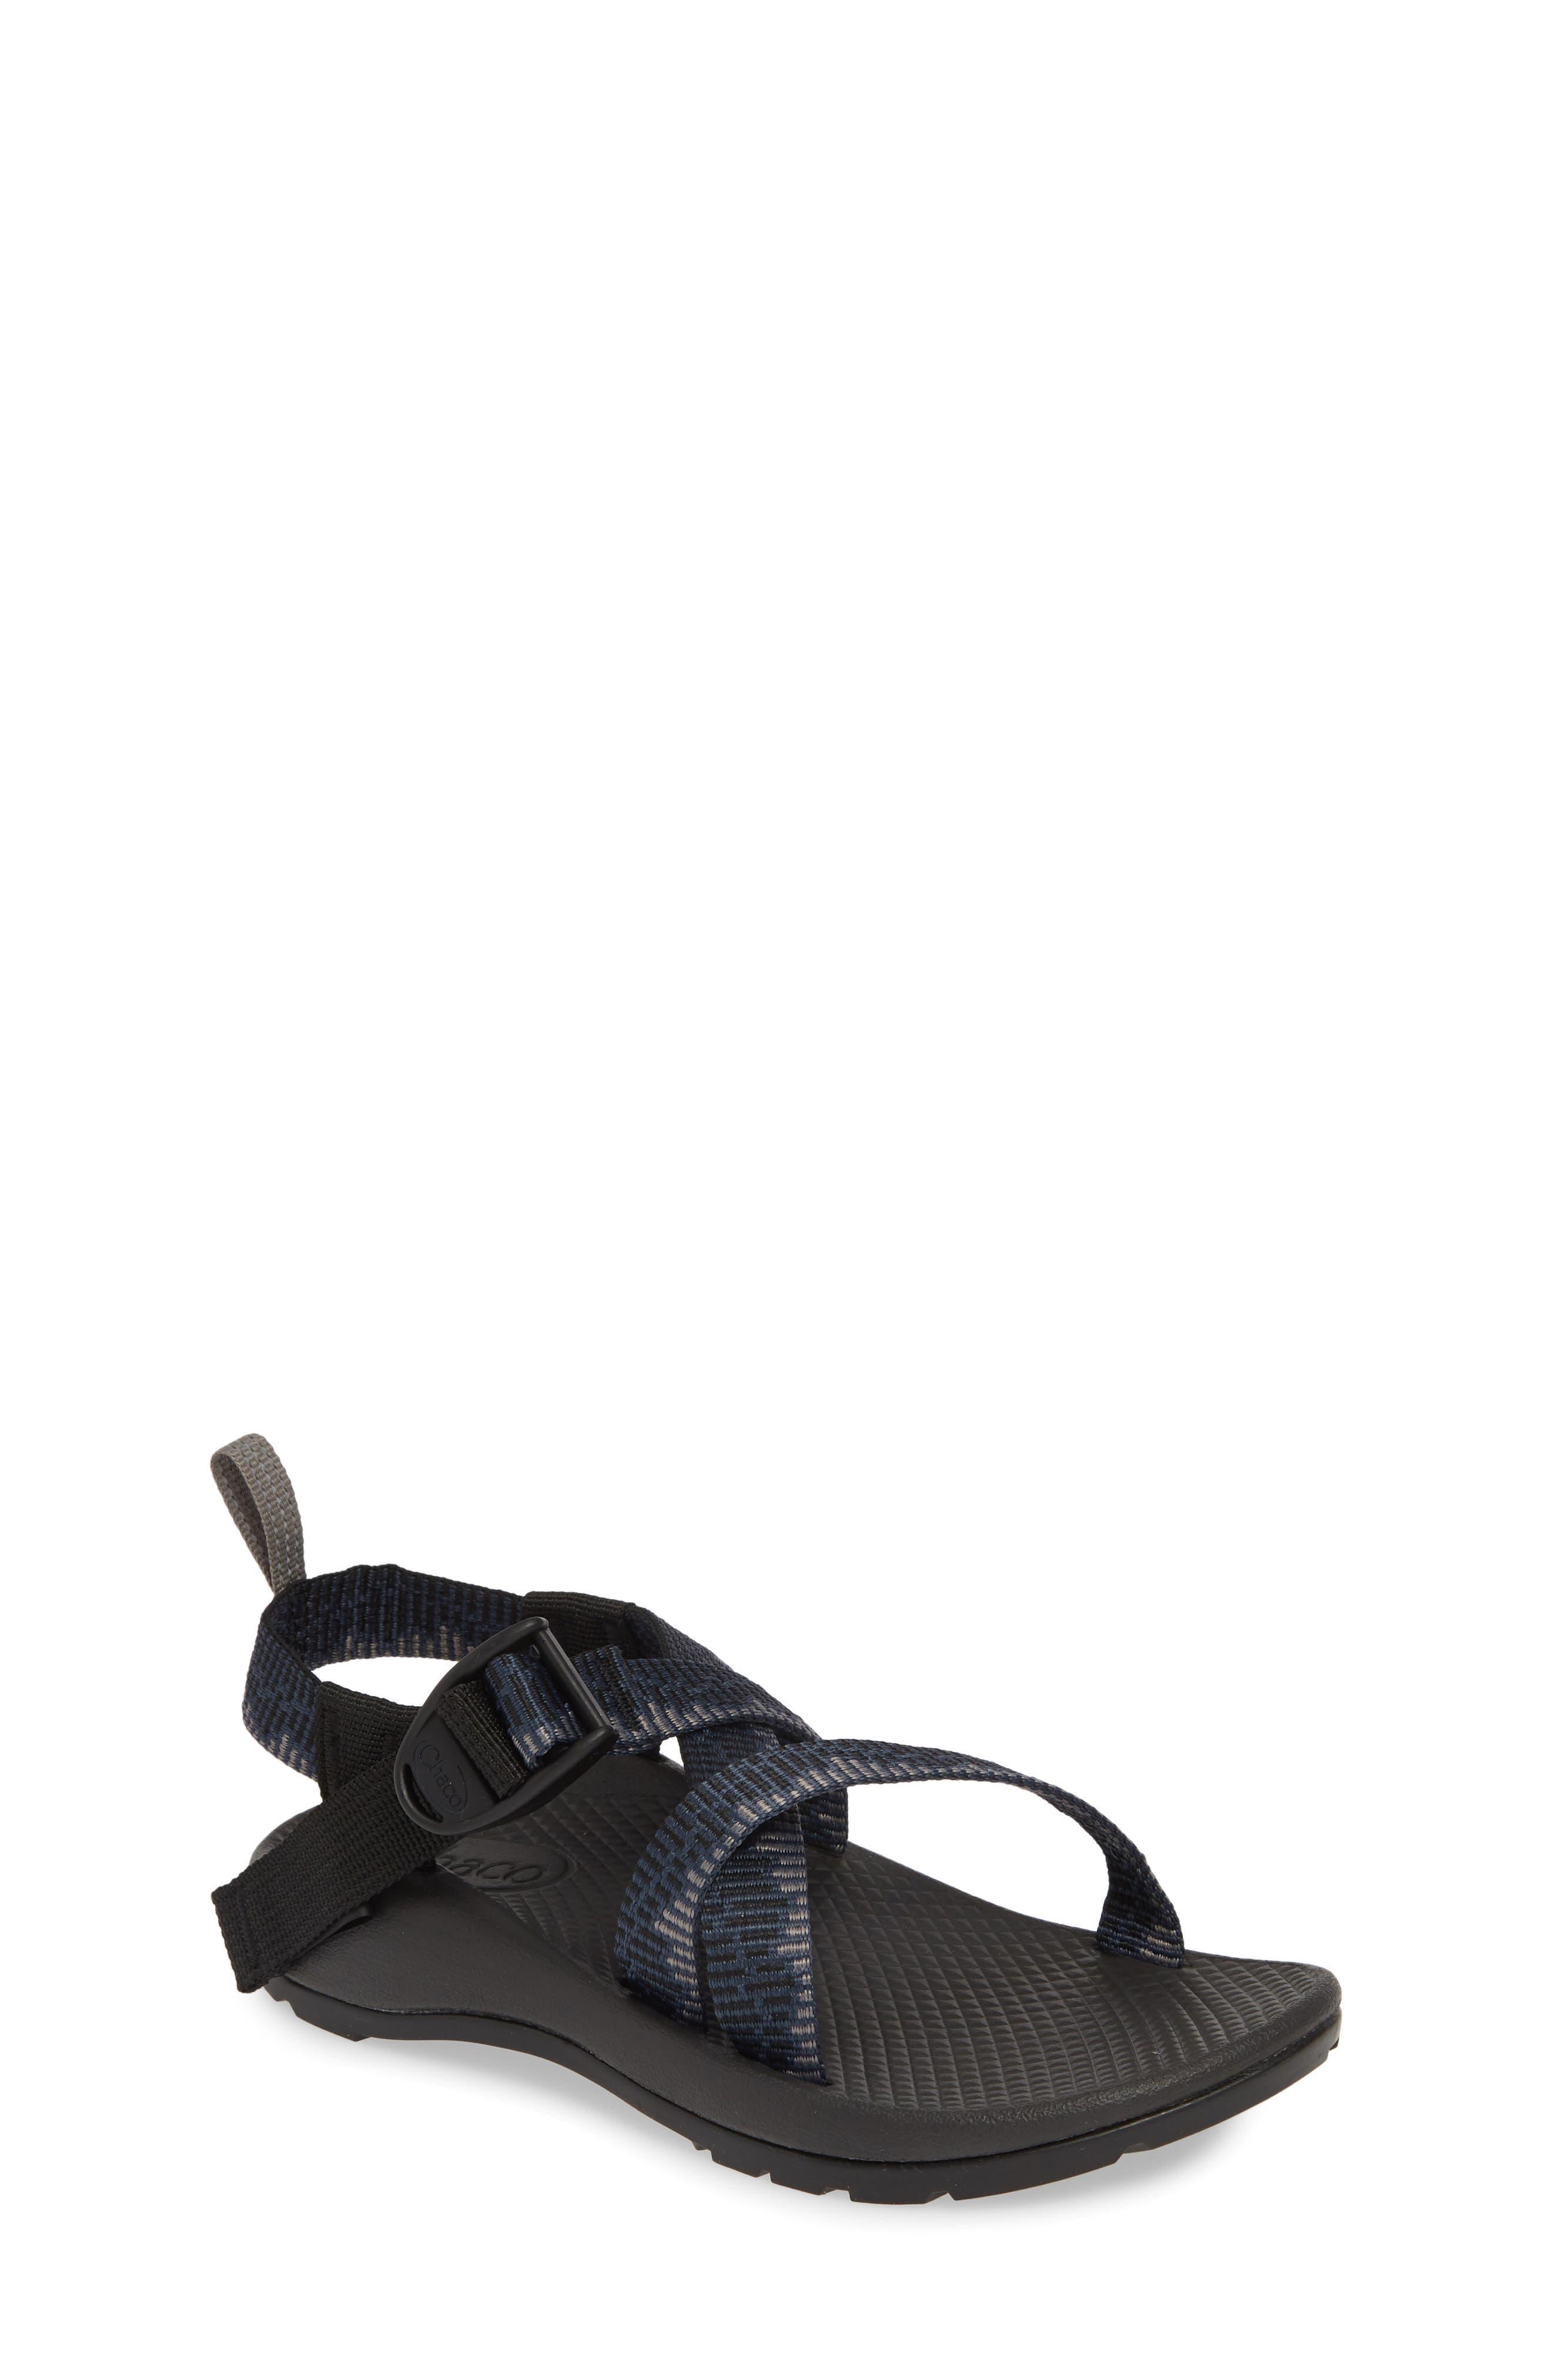 Z/1 Sport Sandal, Main, color, AMP NAVY